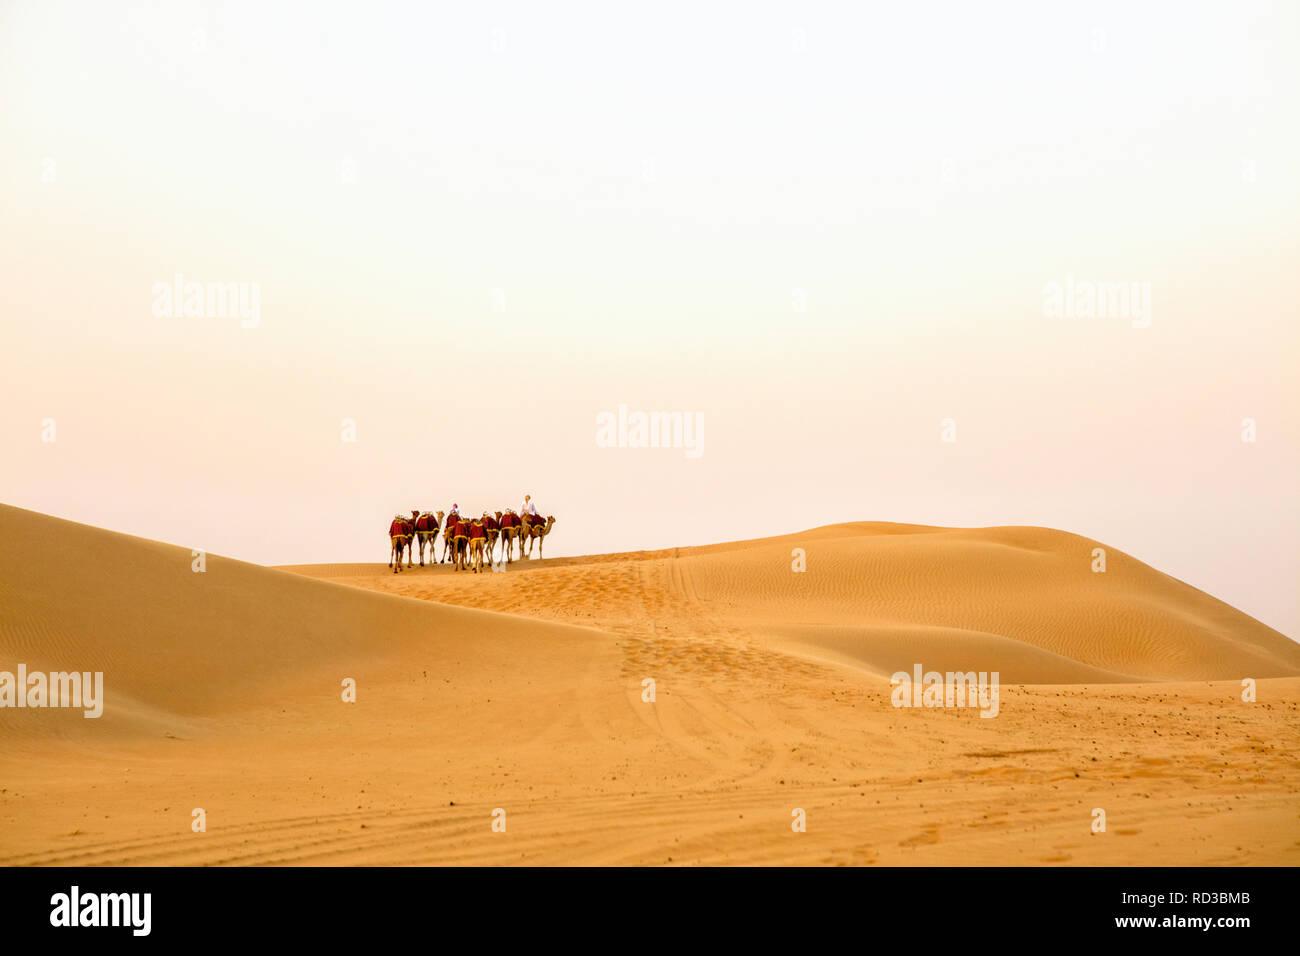 A camel caravan in the Rub' al Khali desert. - Stock Image